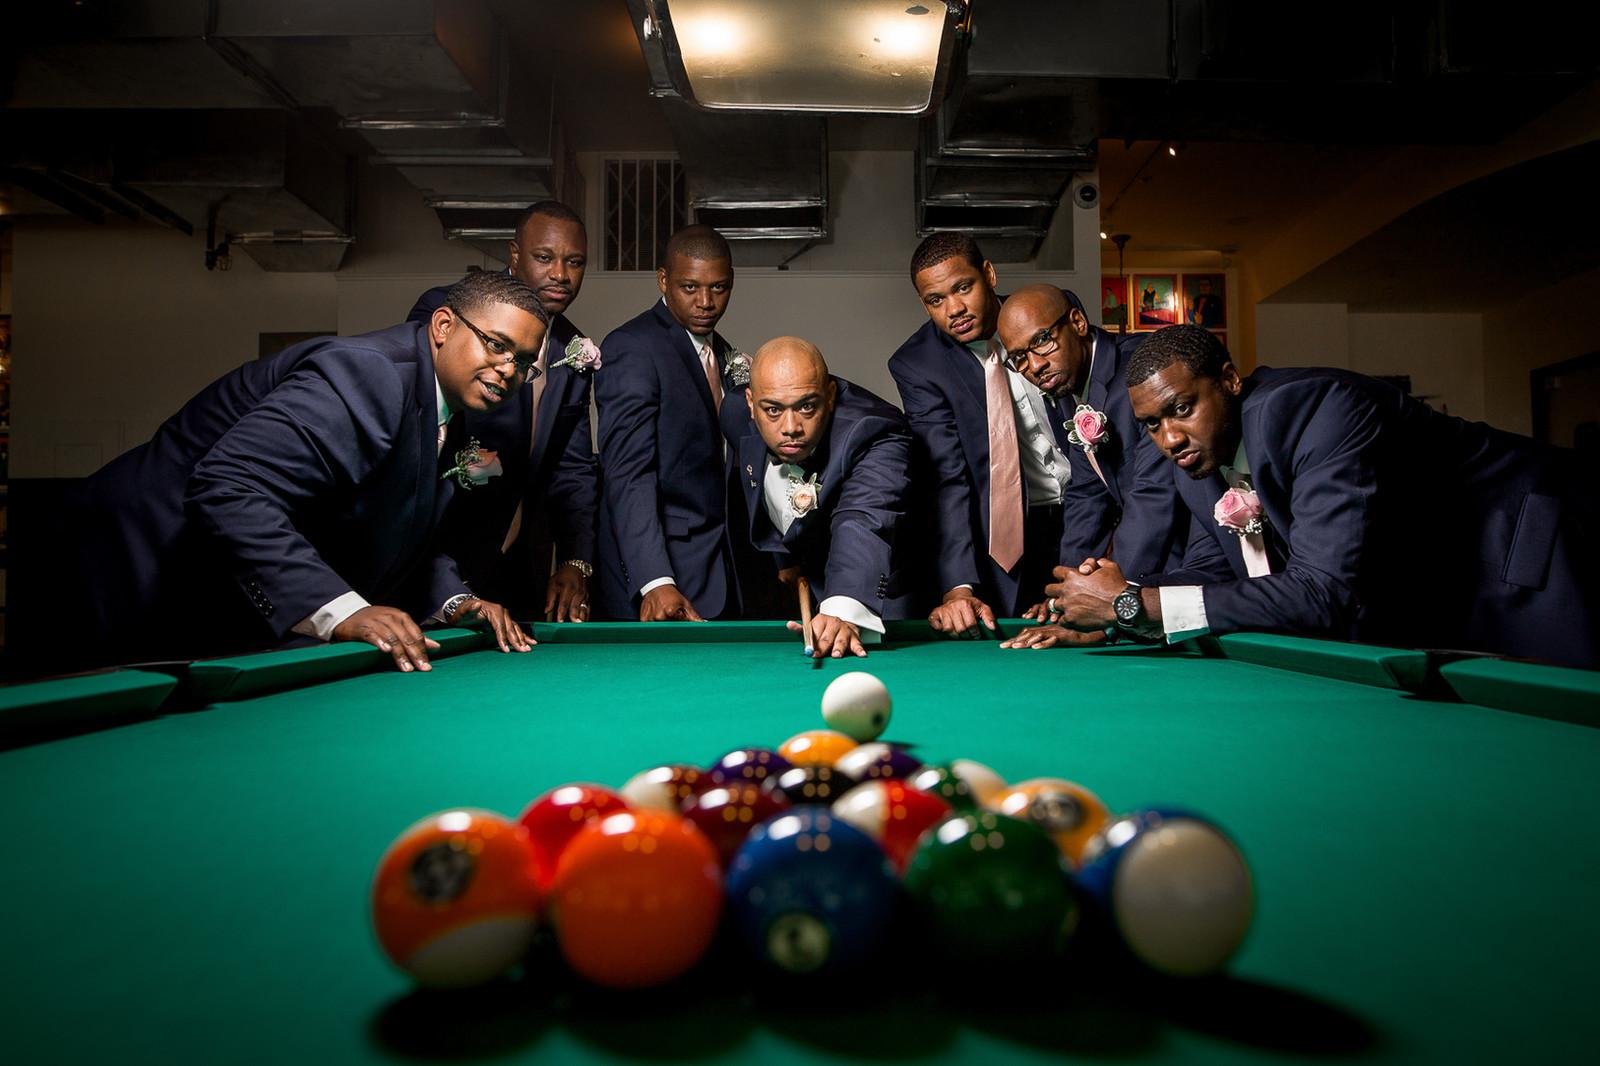 Groomsmen Pool Table Photo | Wedding Photorapher In Richmond VA | Marek K.  Photography | HOME